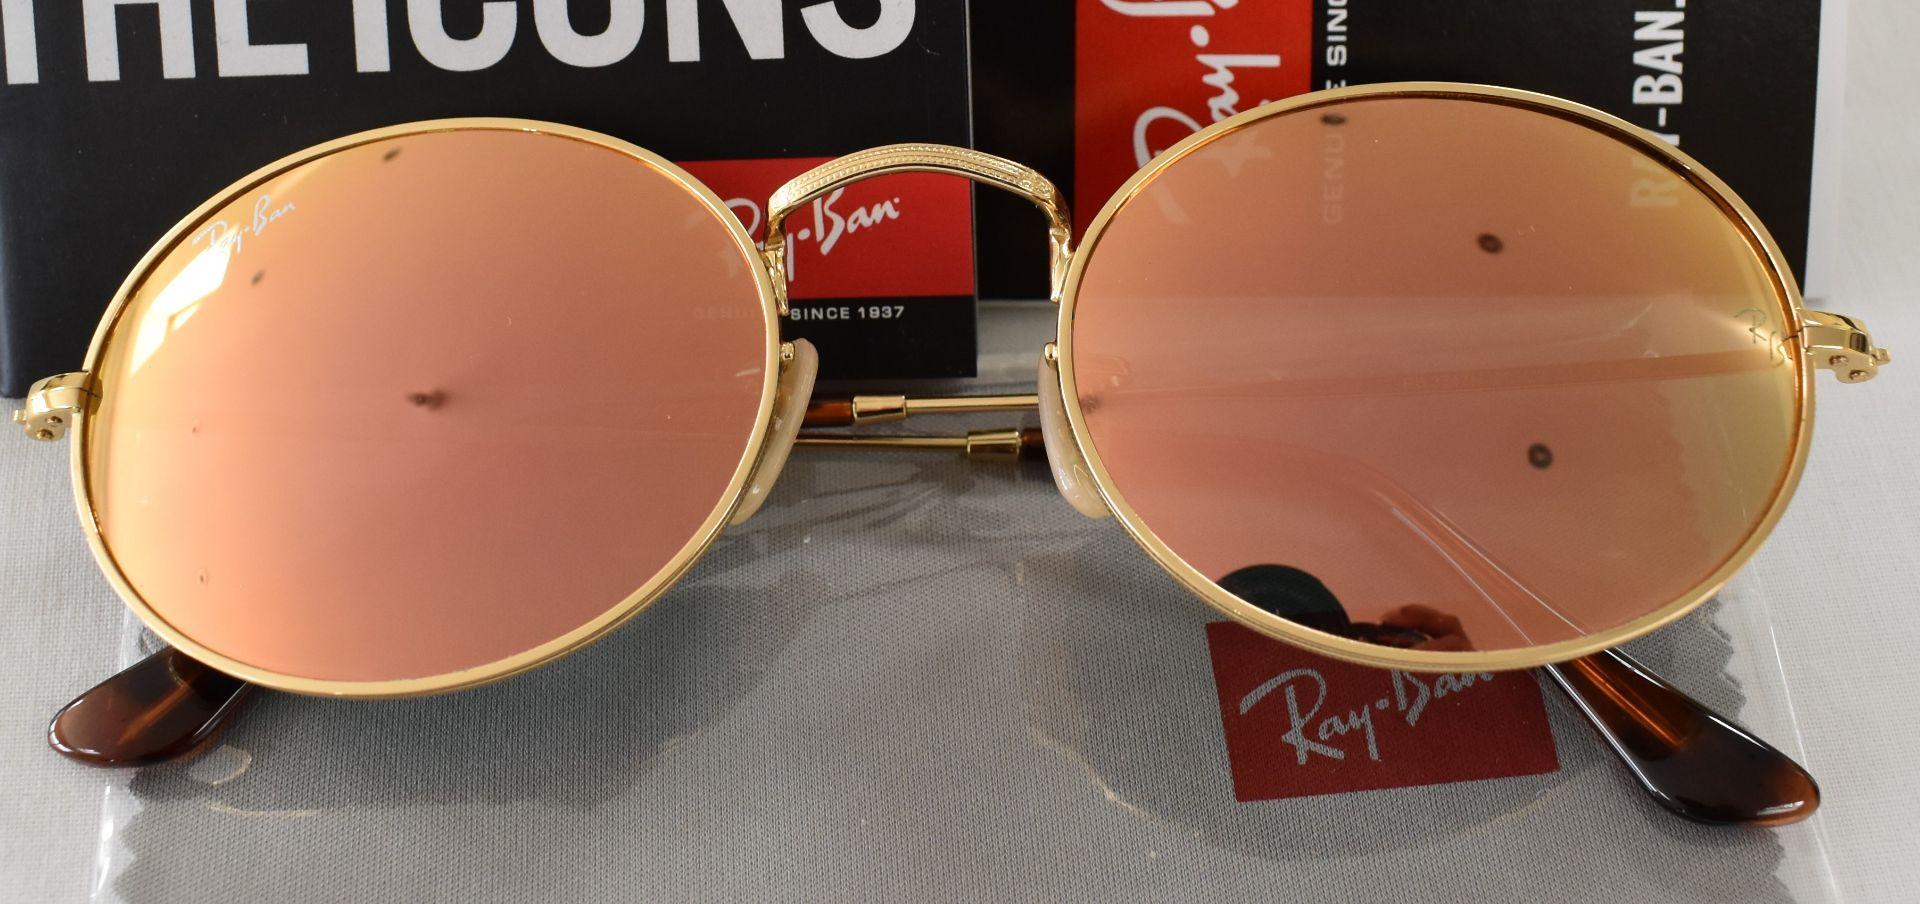 Ray Ban Sunglasses ORB3547N 001/Z2 *3N - Image 2 of 3